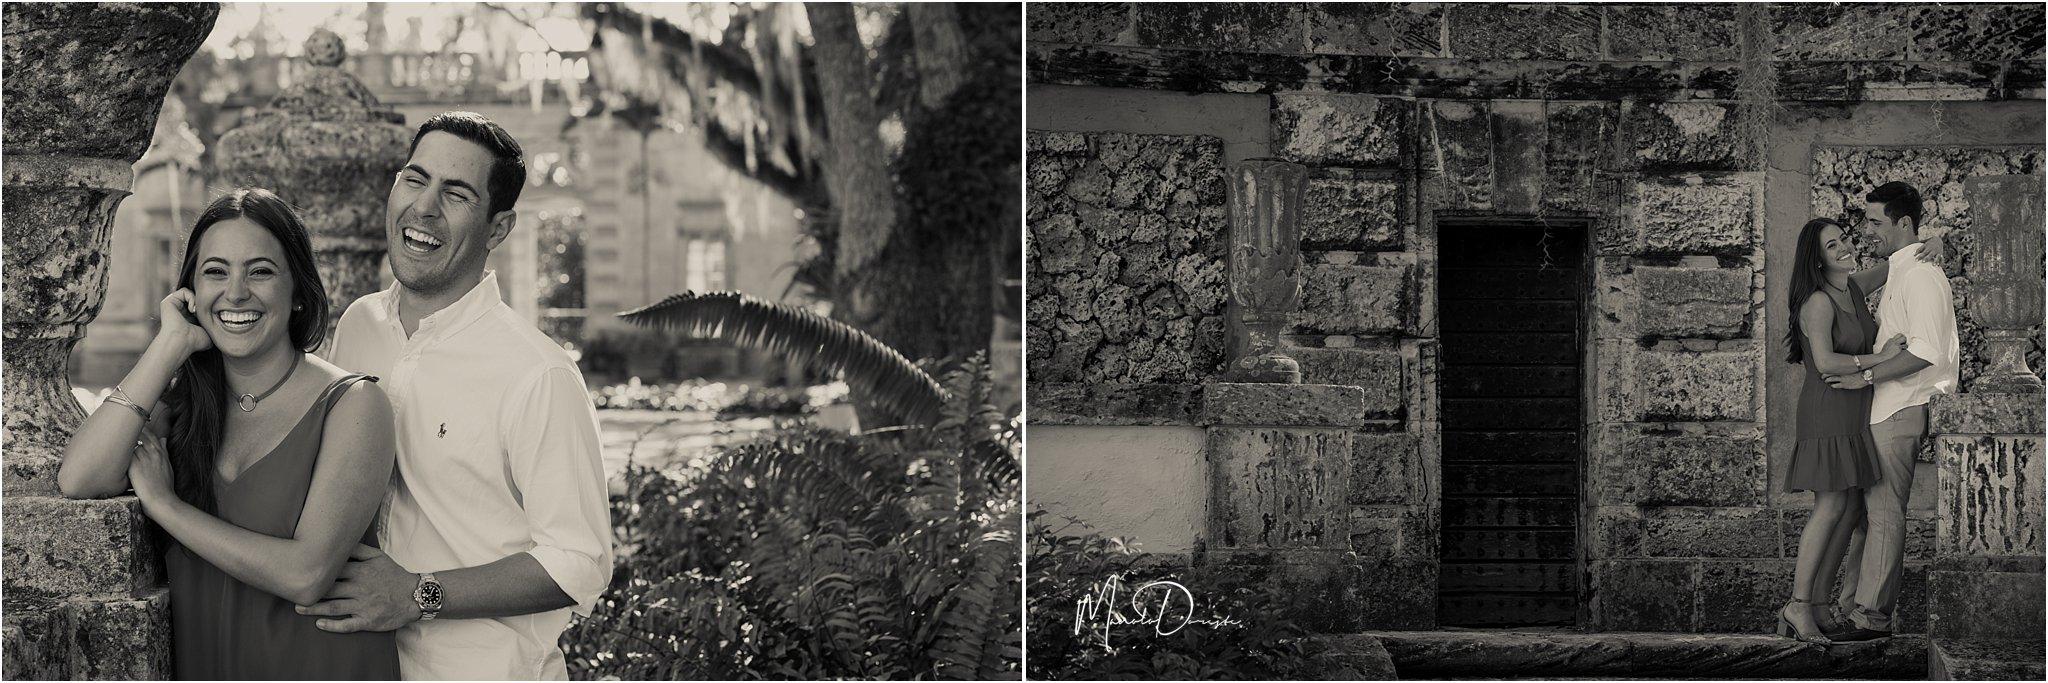 00859_ManoloDoreste_InFocusStudios_Wedding_Family_Photography_Miami_MiamiPhotographer.jpg